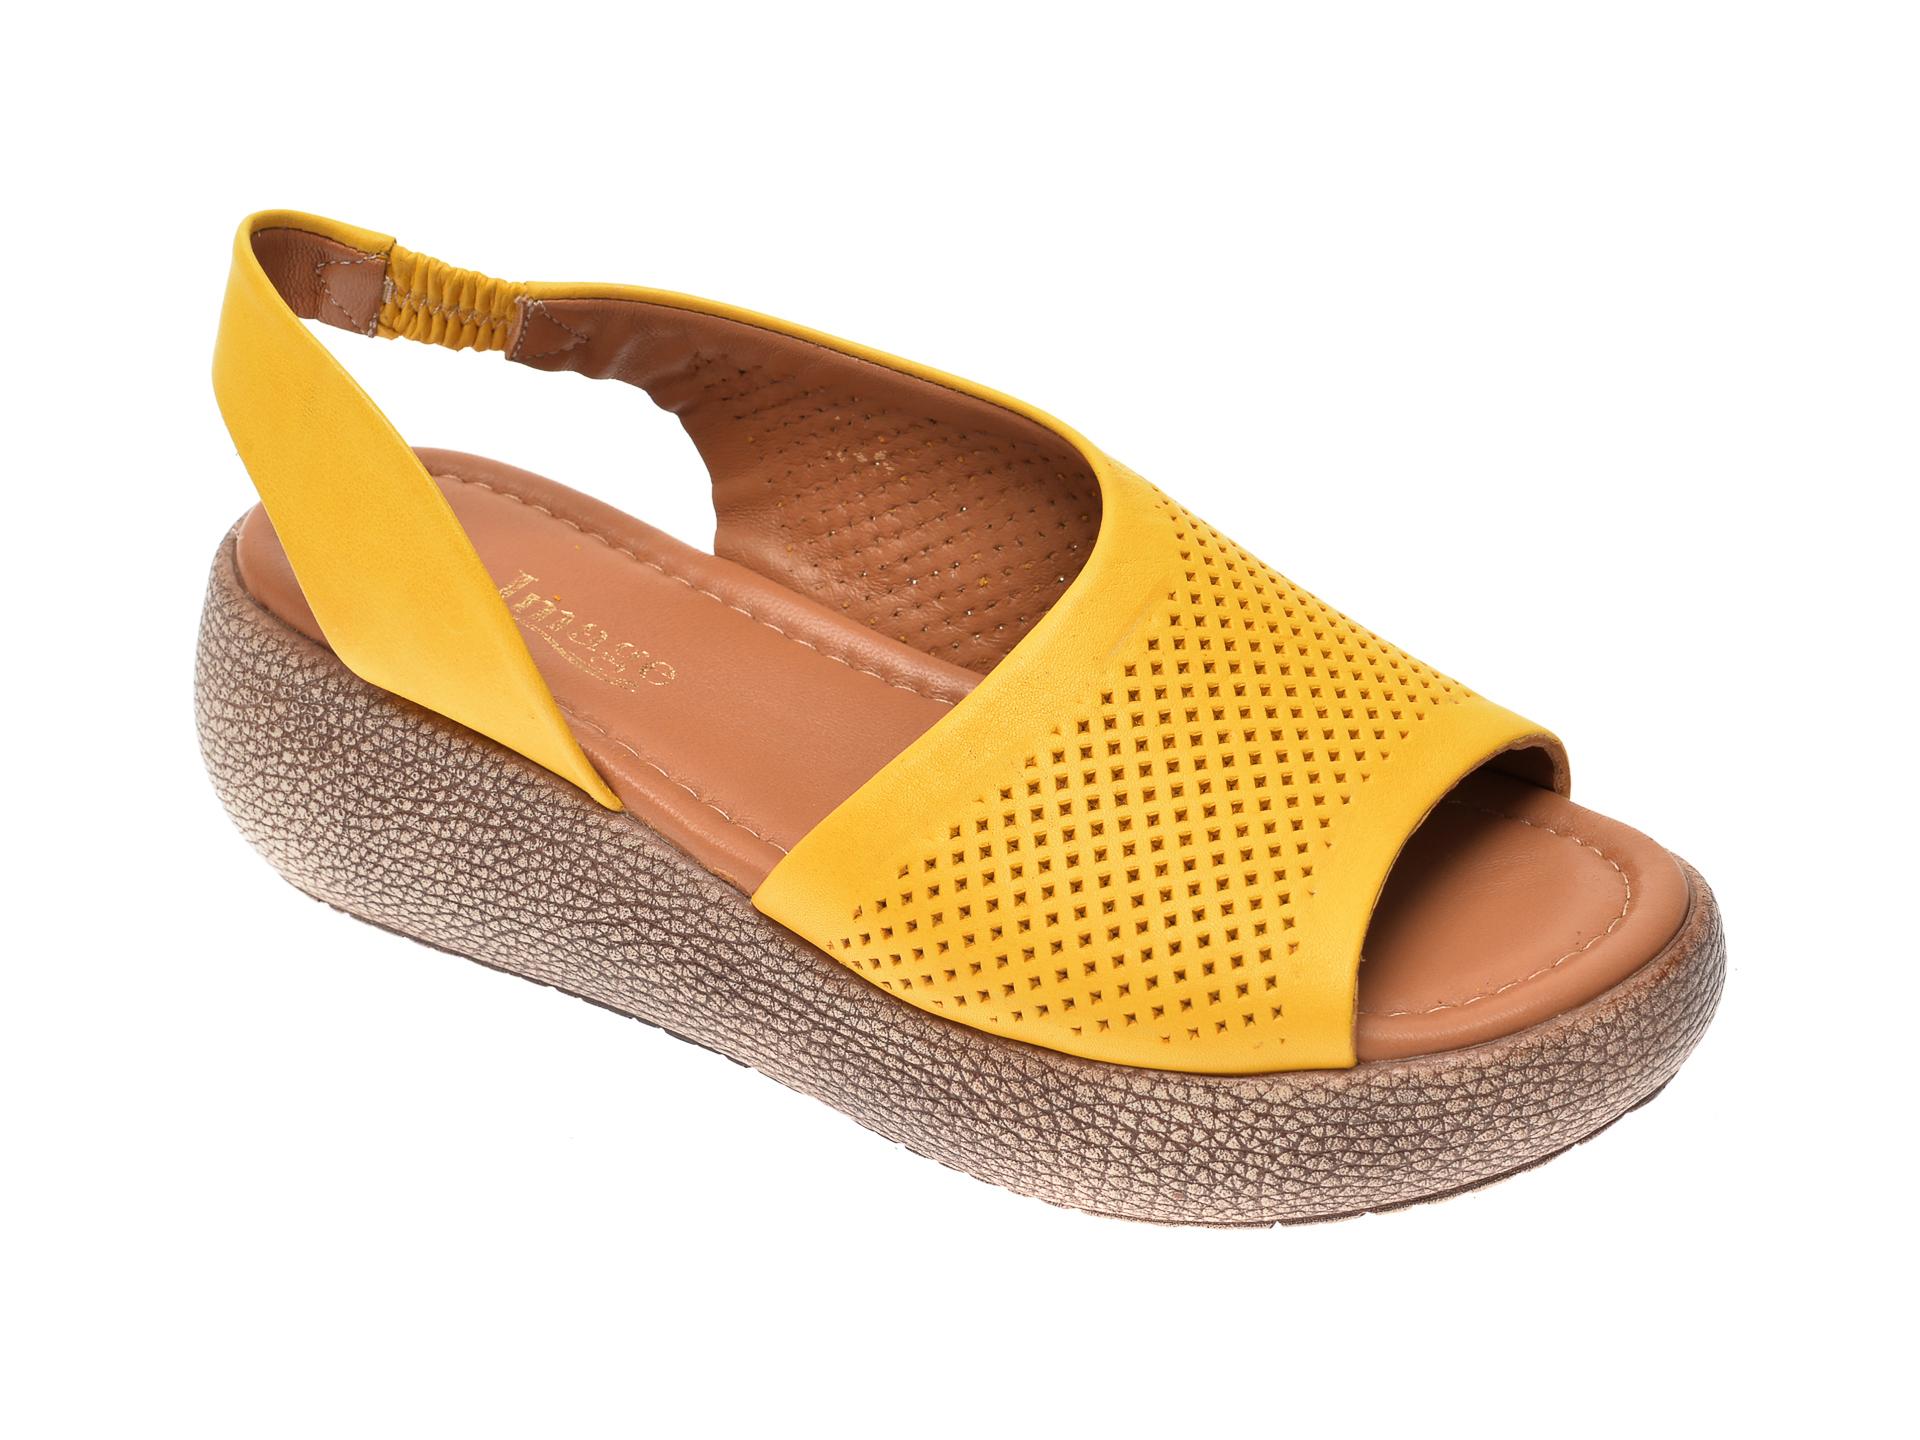 Sandale IMAGE galbene, 6033, din piele naturala imagine